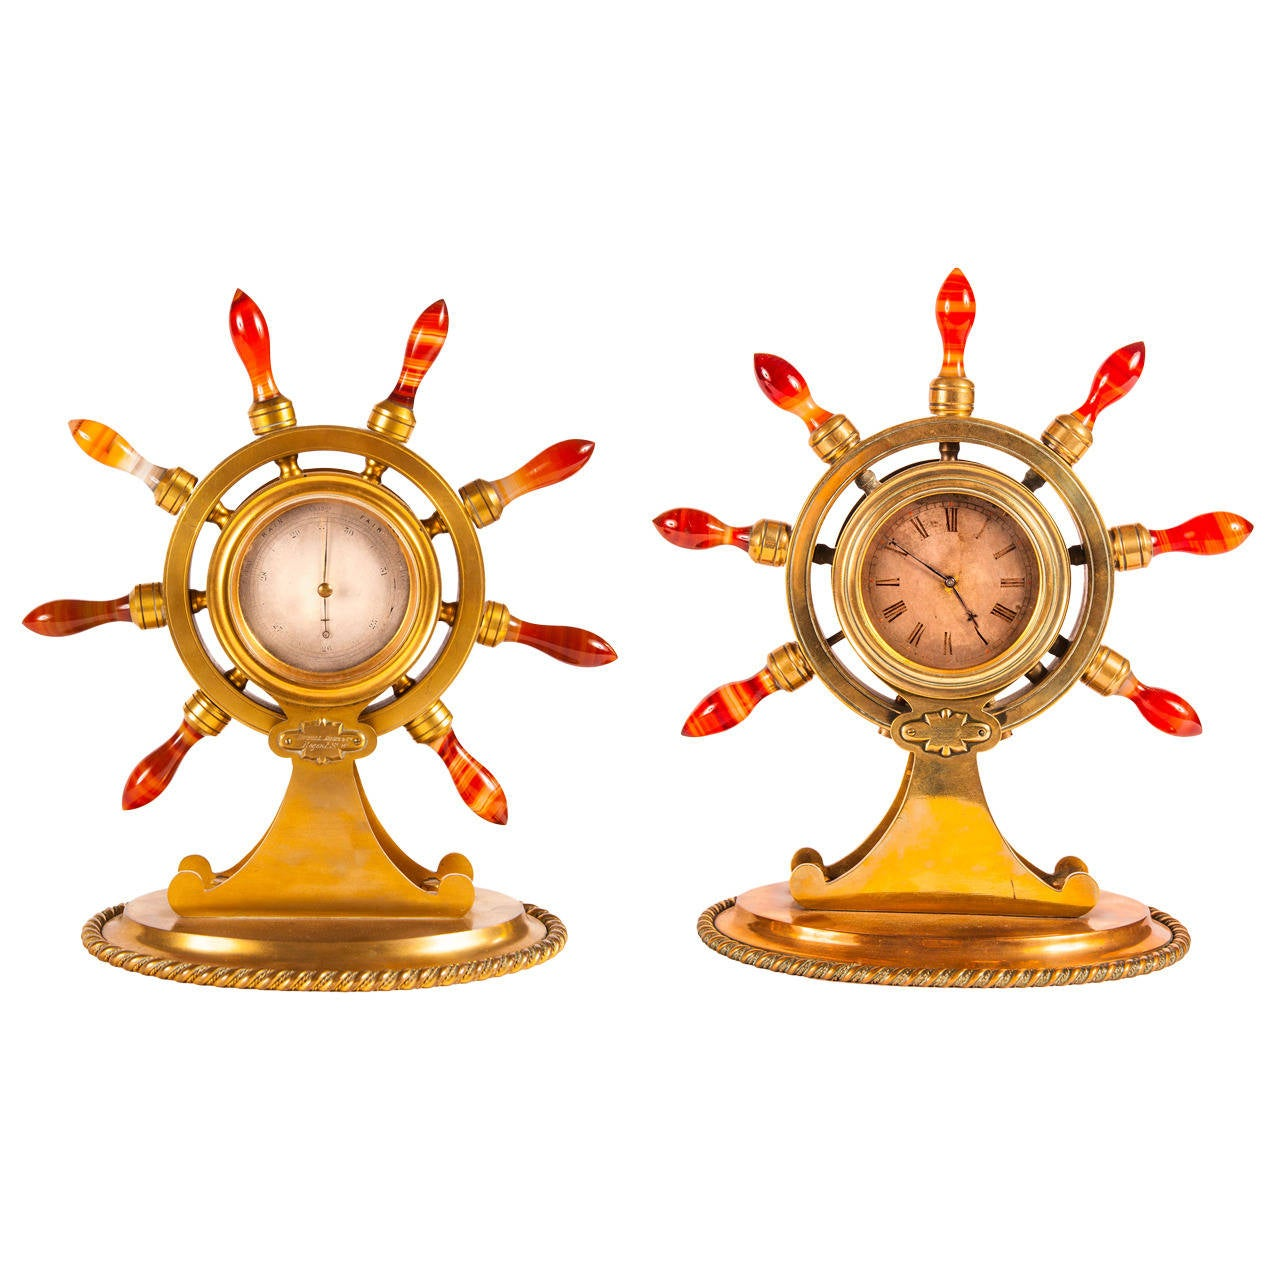 Victorian Ormolu Clock and Barometer Desk Set, of Maritime or Naval Interest